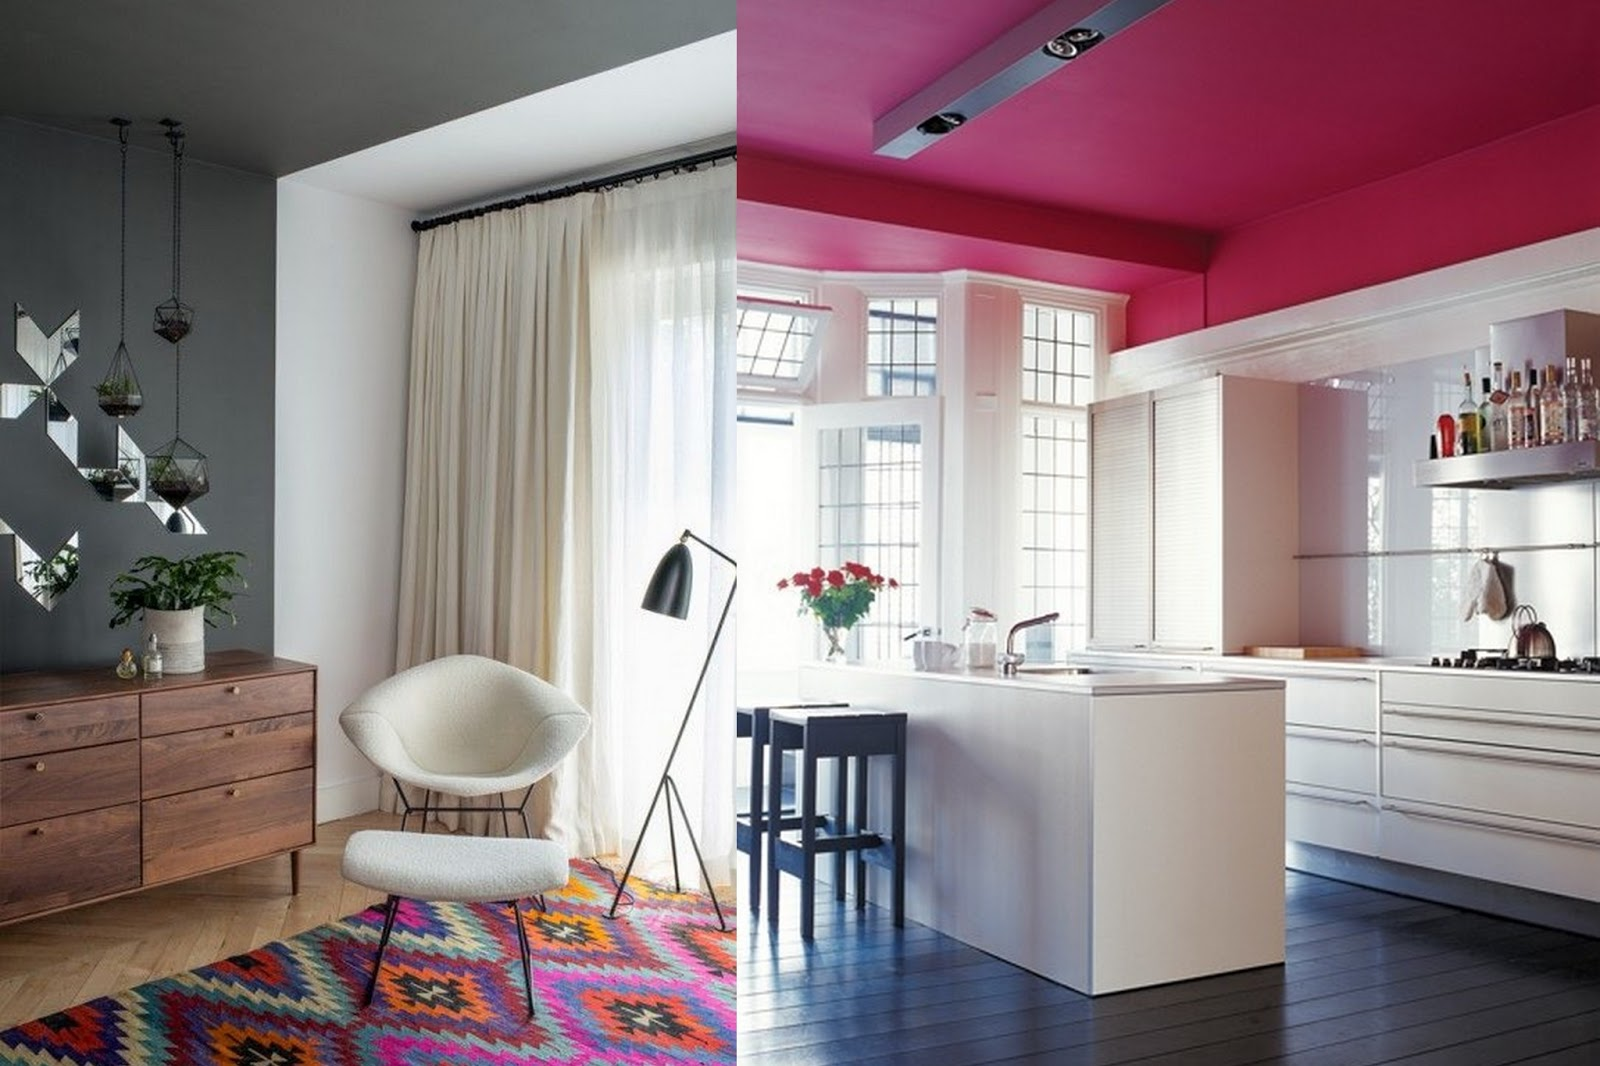 Casaenco kleur in je interieur - Hoe roze verf ...